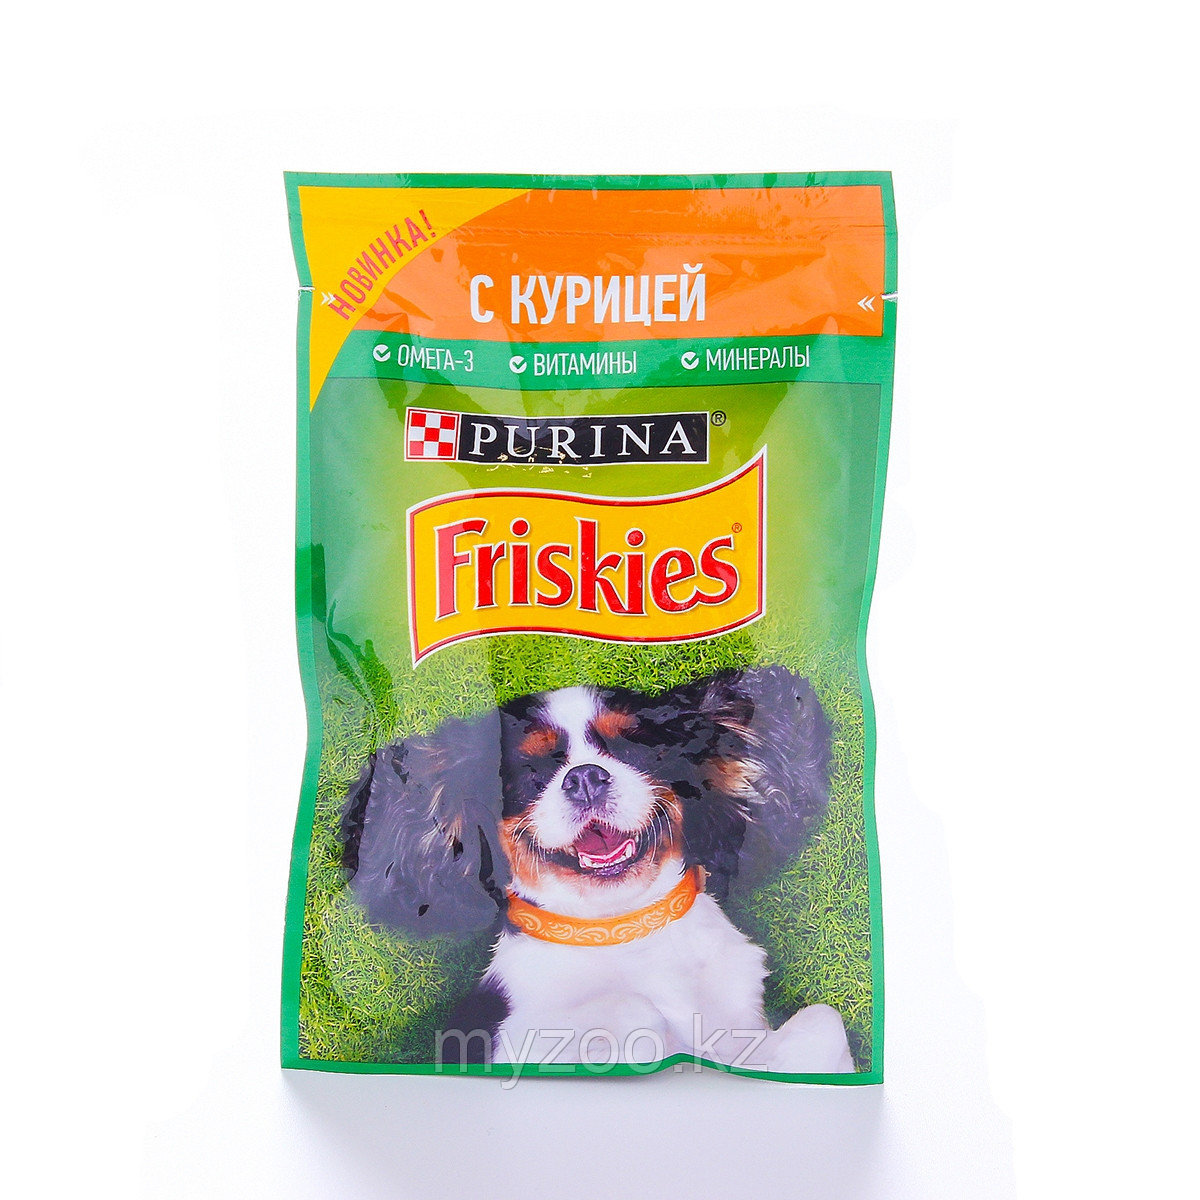 Friskies Фрискис влажный корм для собак с курицей,85гр